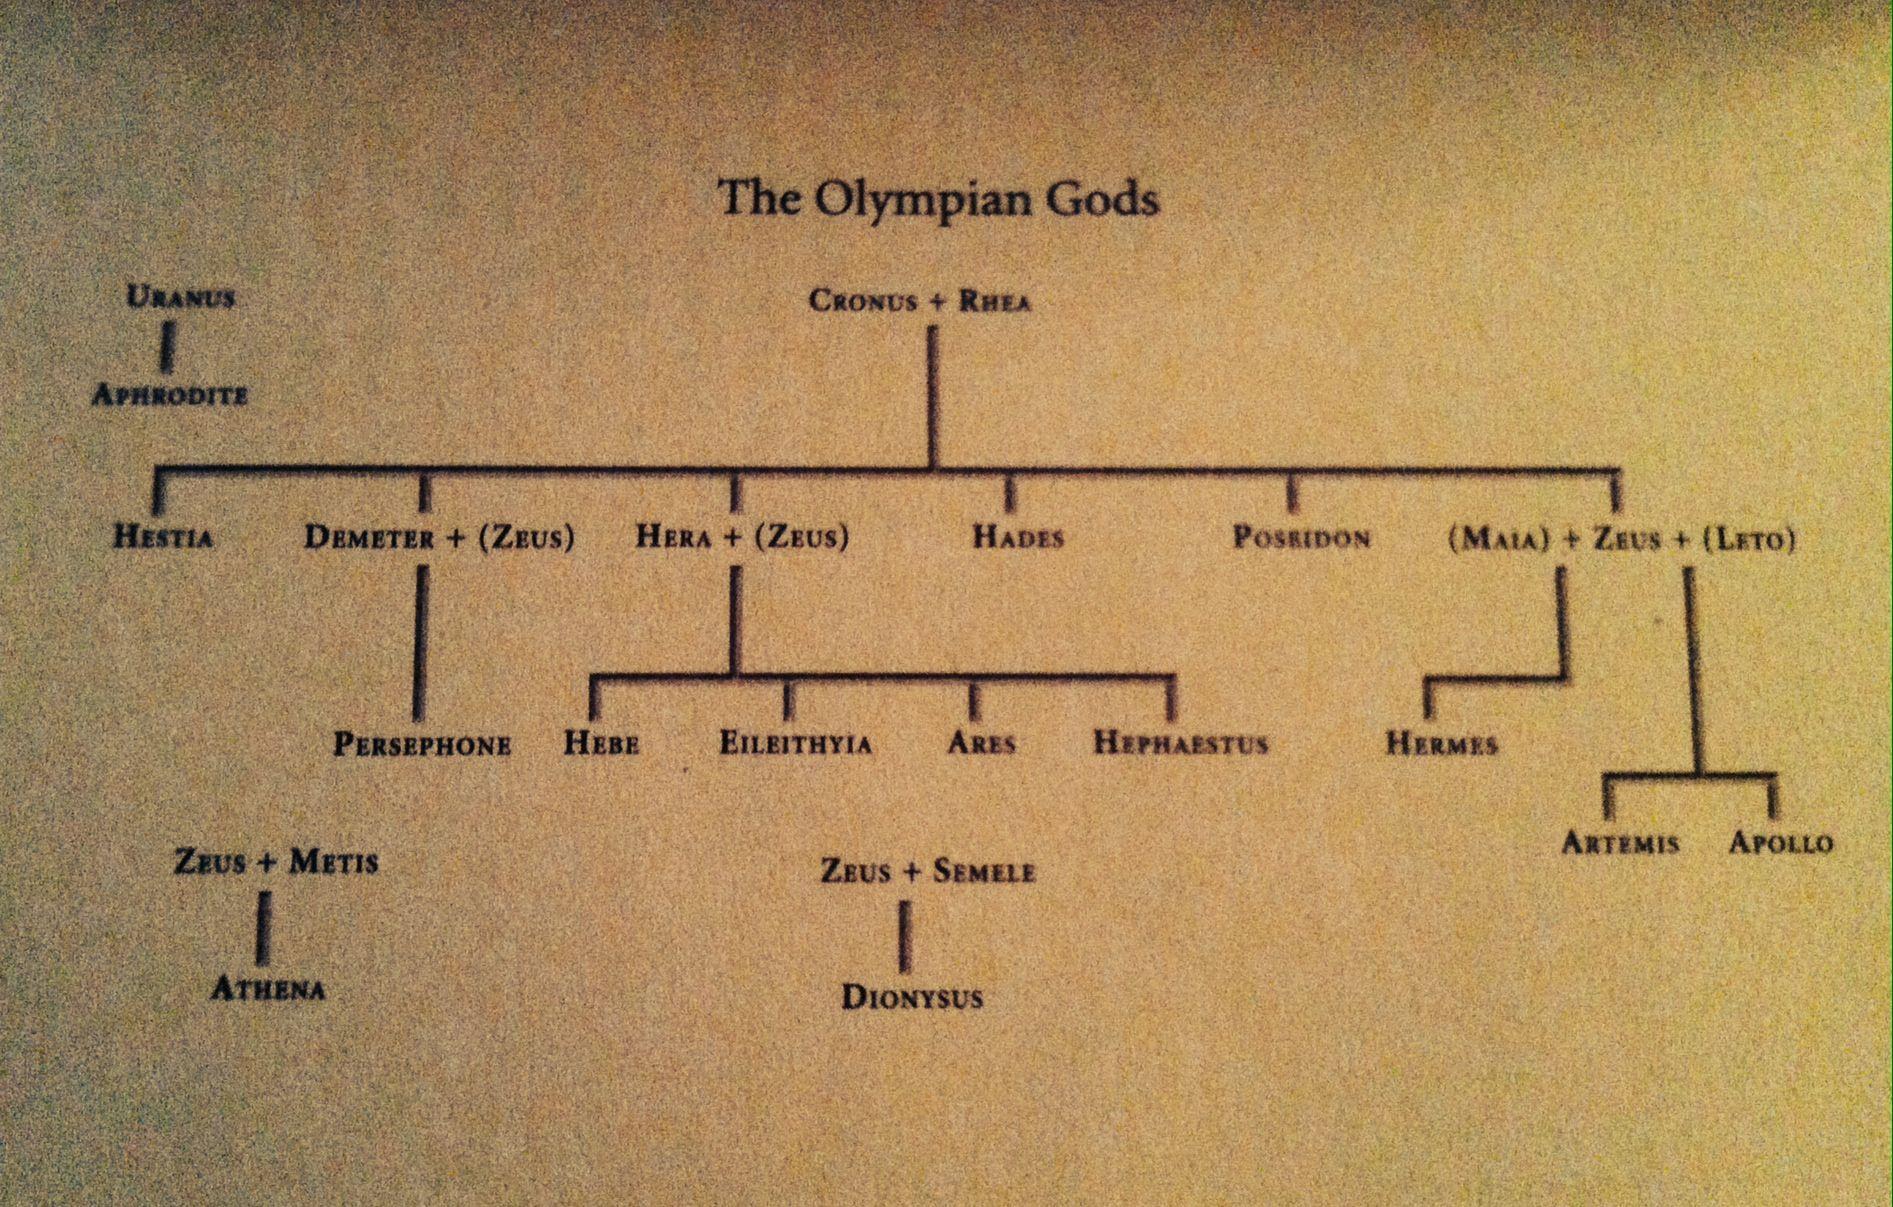 Greek Mythology The Olympian Gods Family Tree Greece Mythology Greek Mythology Greek Gods